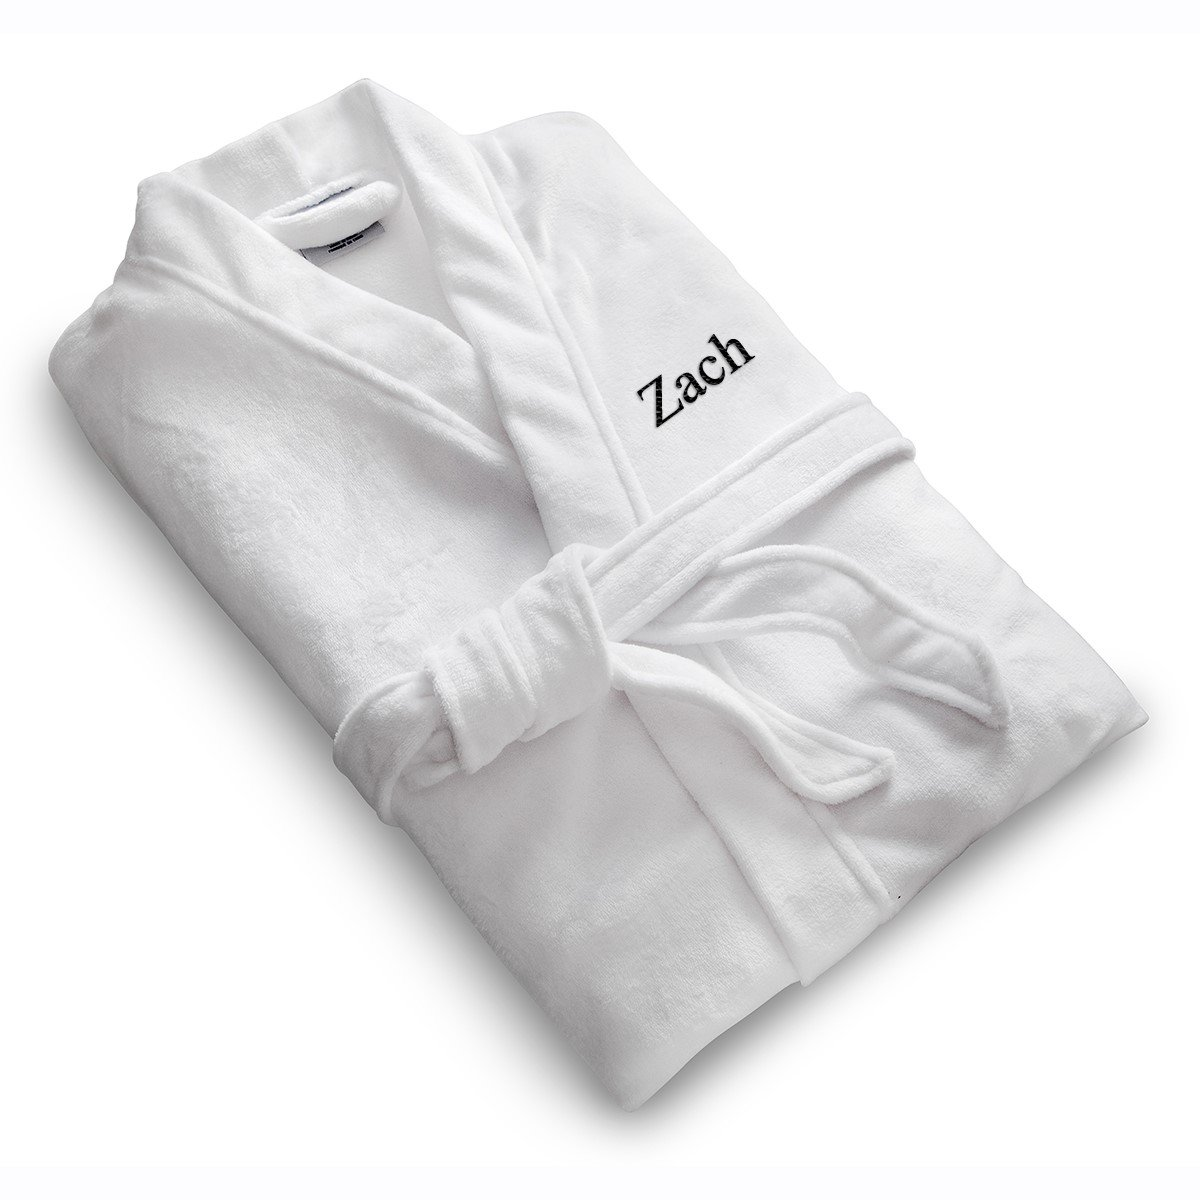 A Gift Personalized Personalized White Micro Fiber Bath Robe forHim